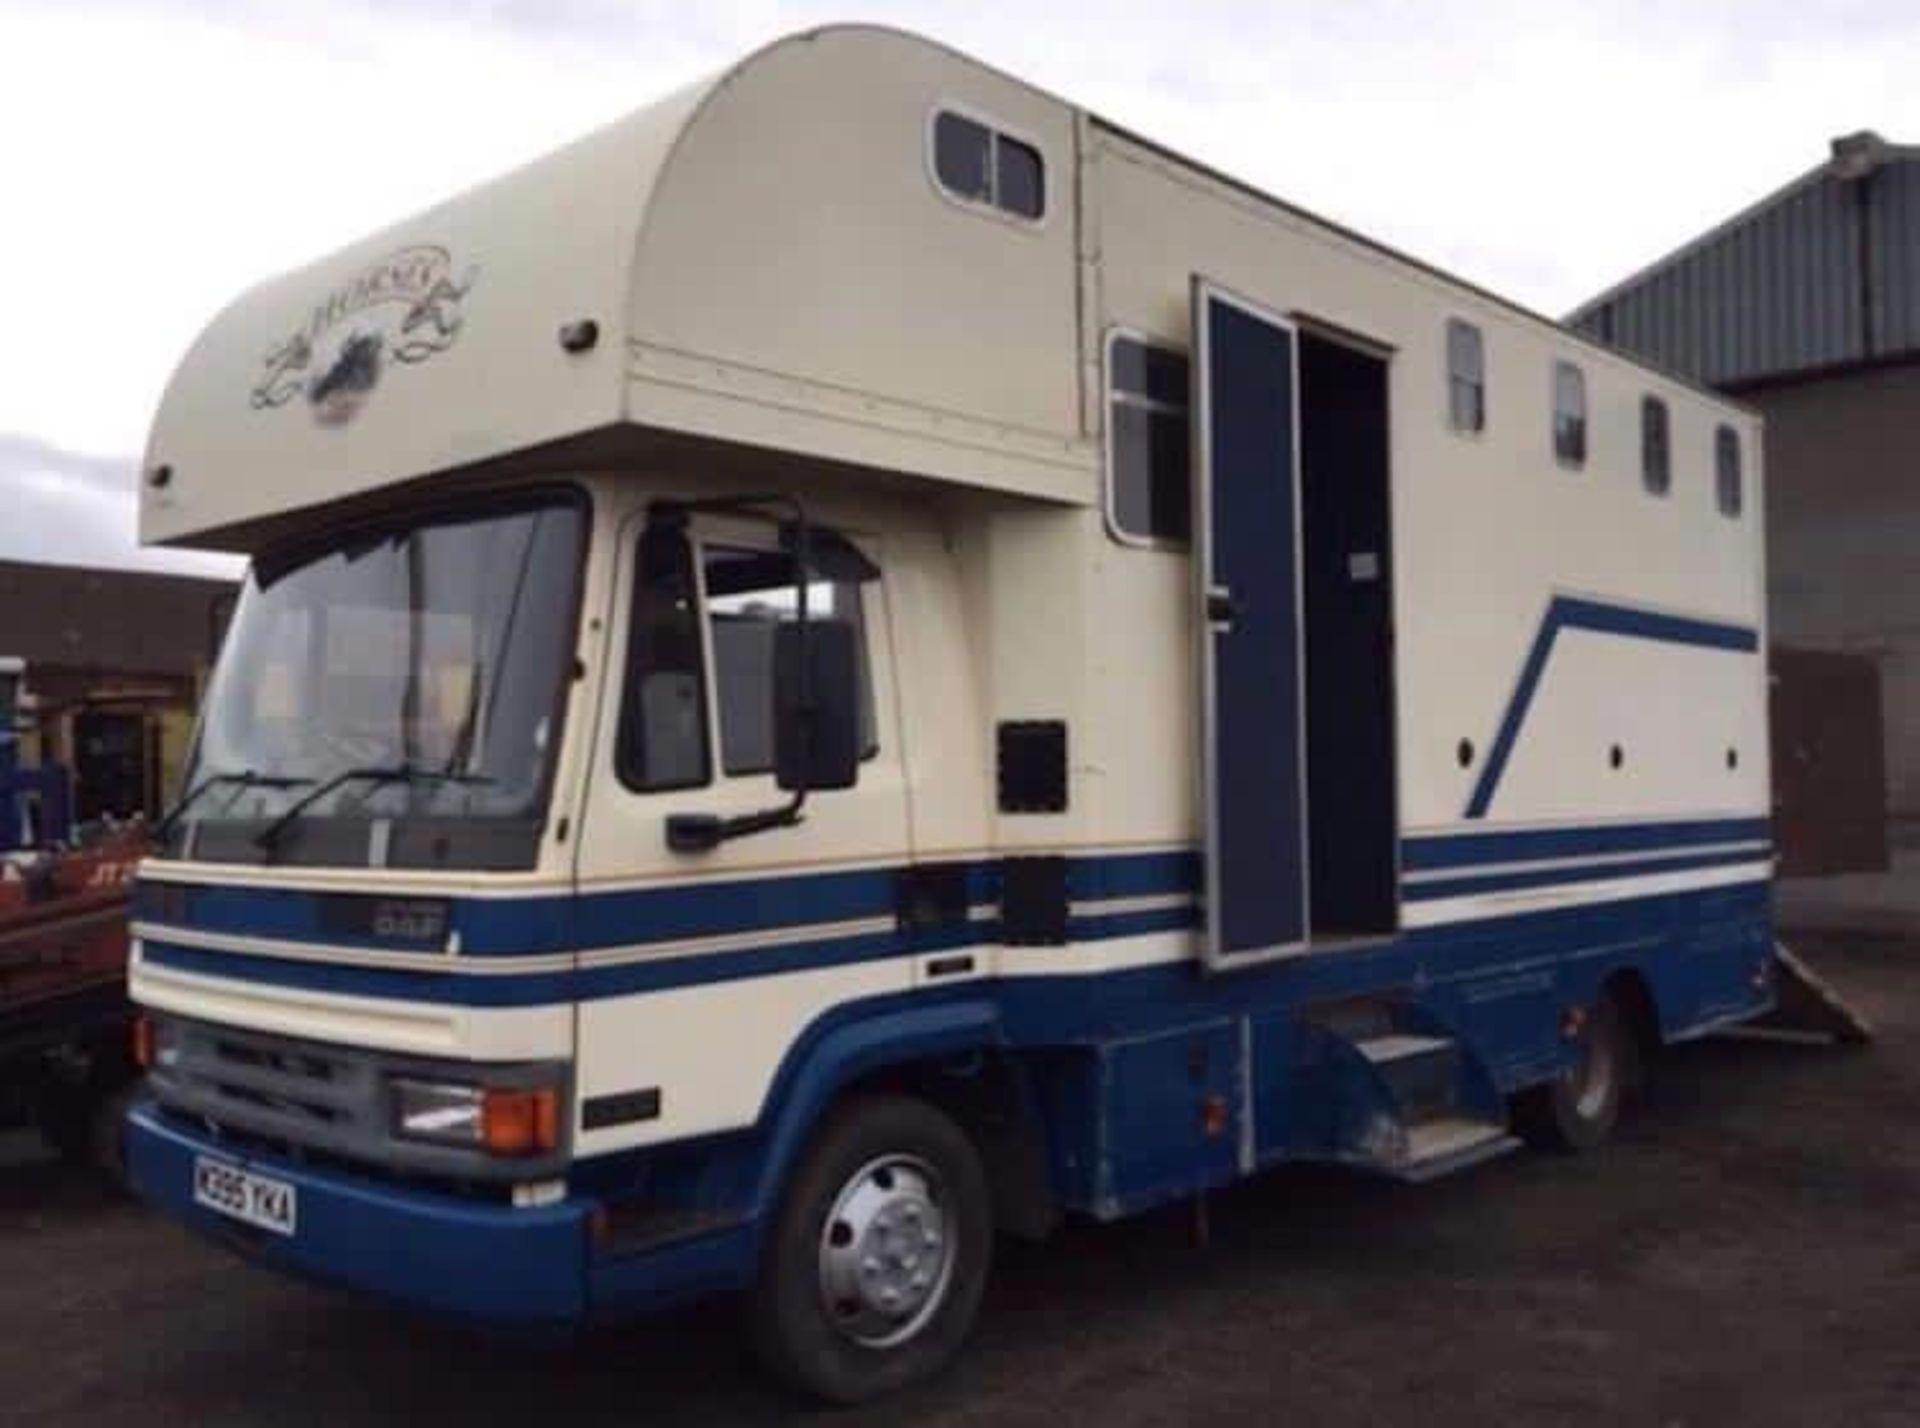 1995 Leyland Daf 7.5 Ton horse box lorry